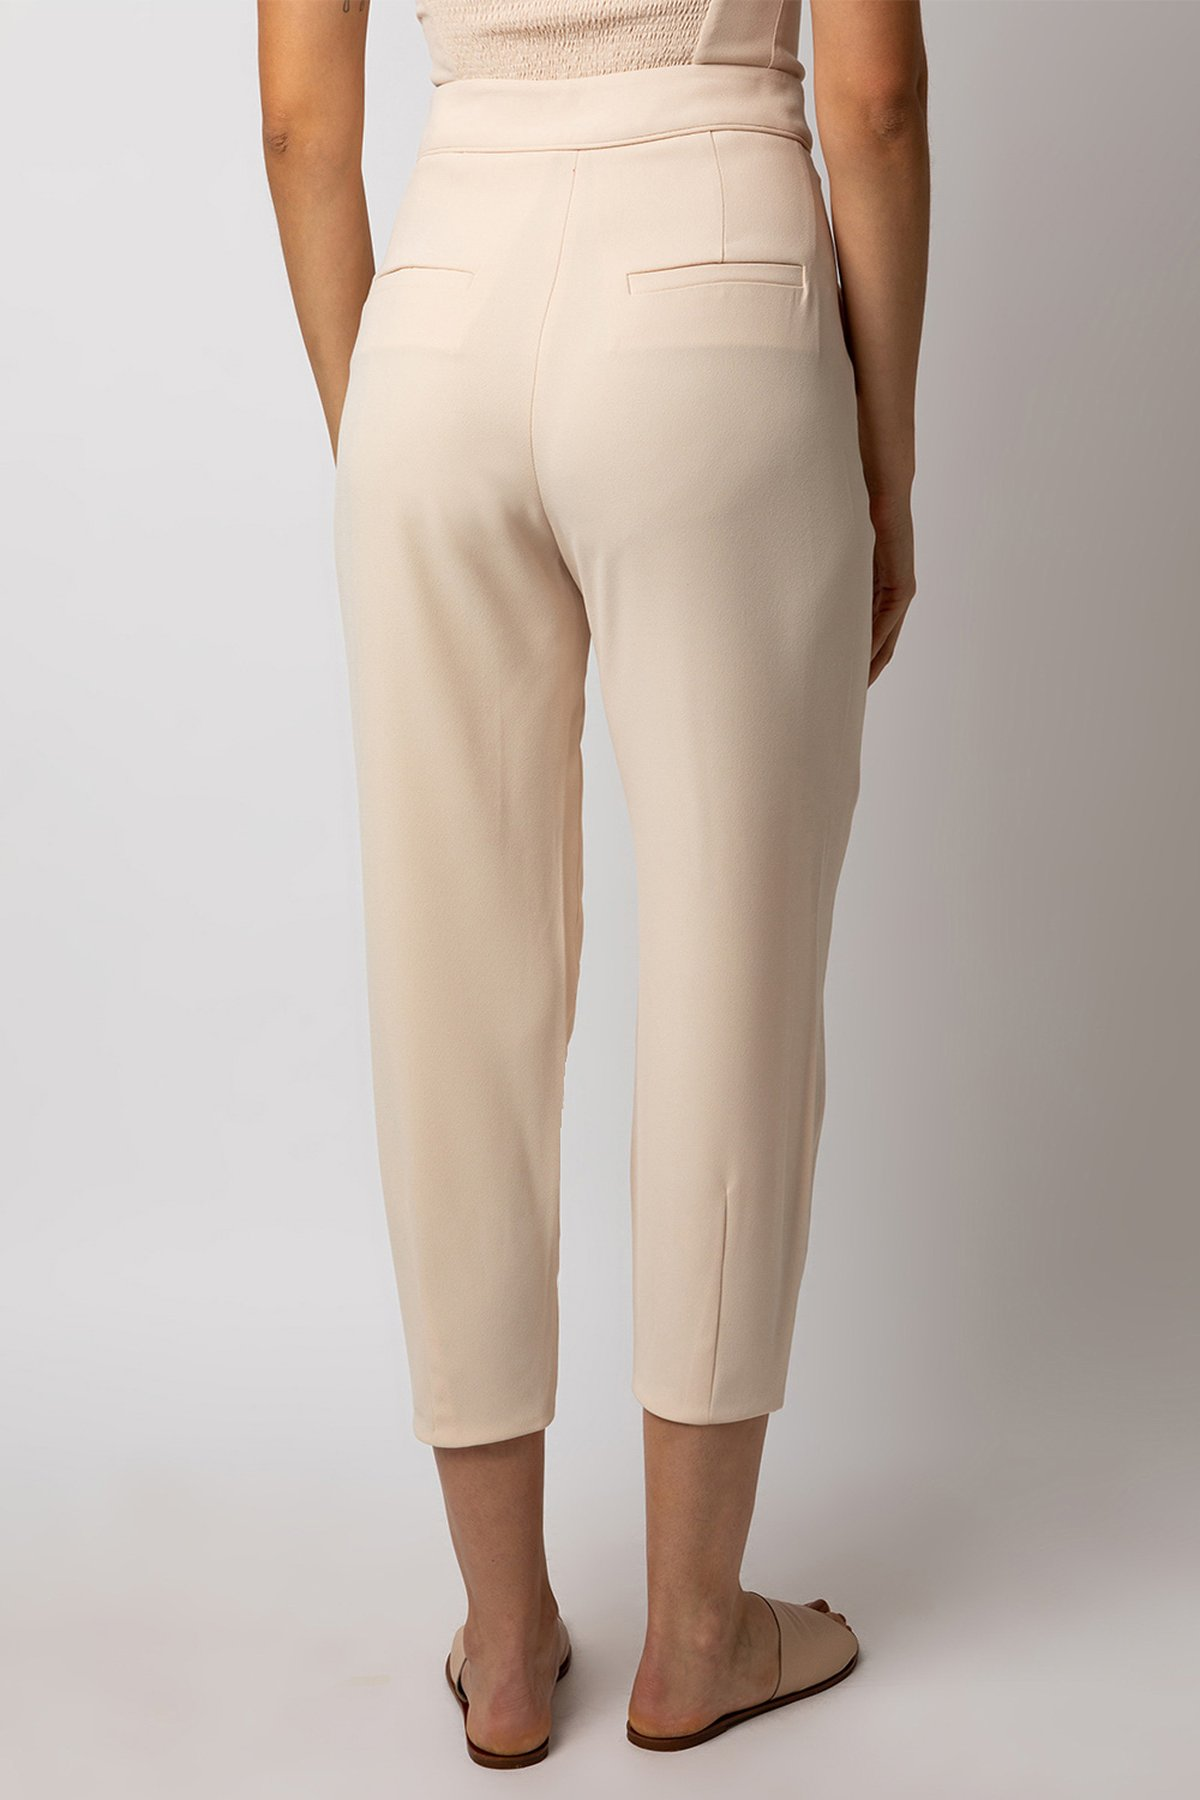 Calça Pantalona Preta Trilogy - Trilogy Store